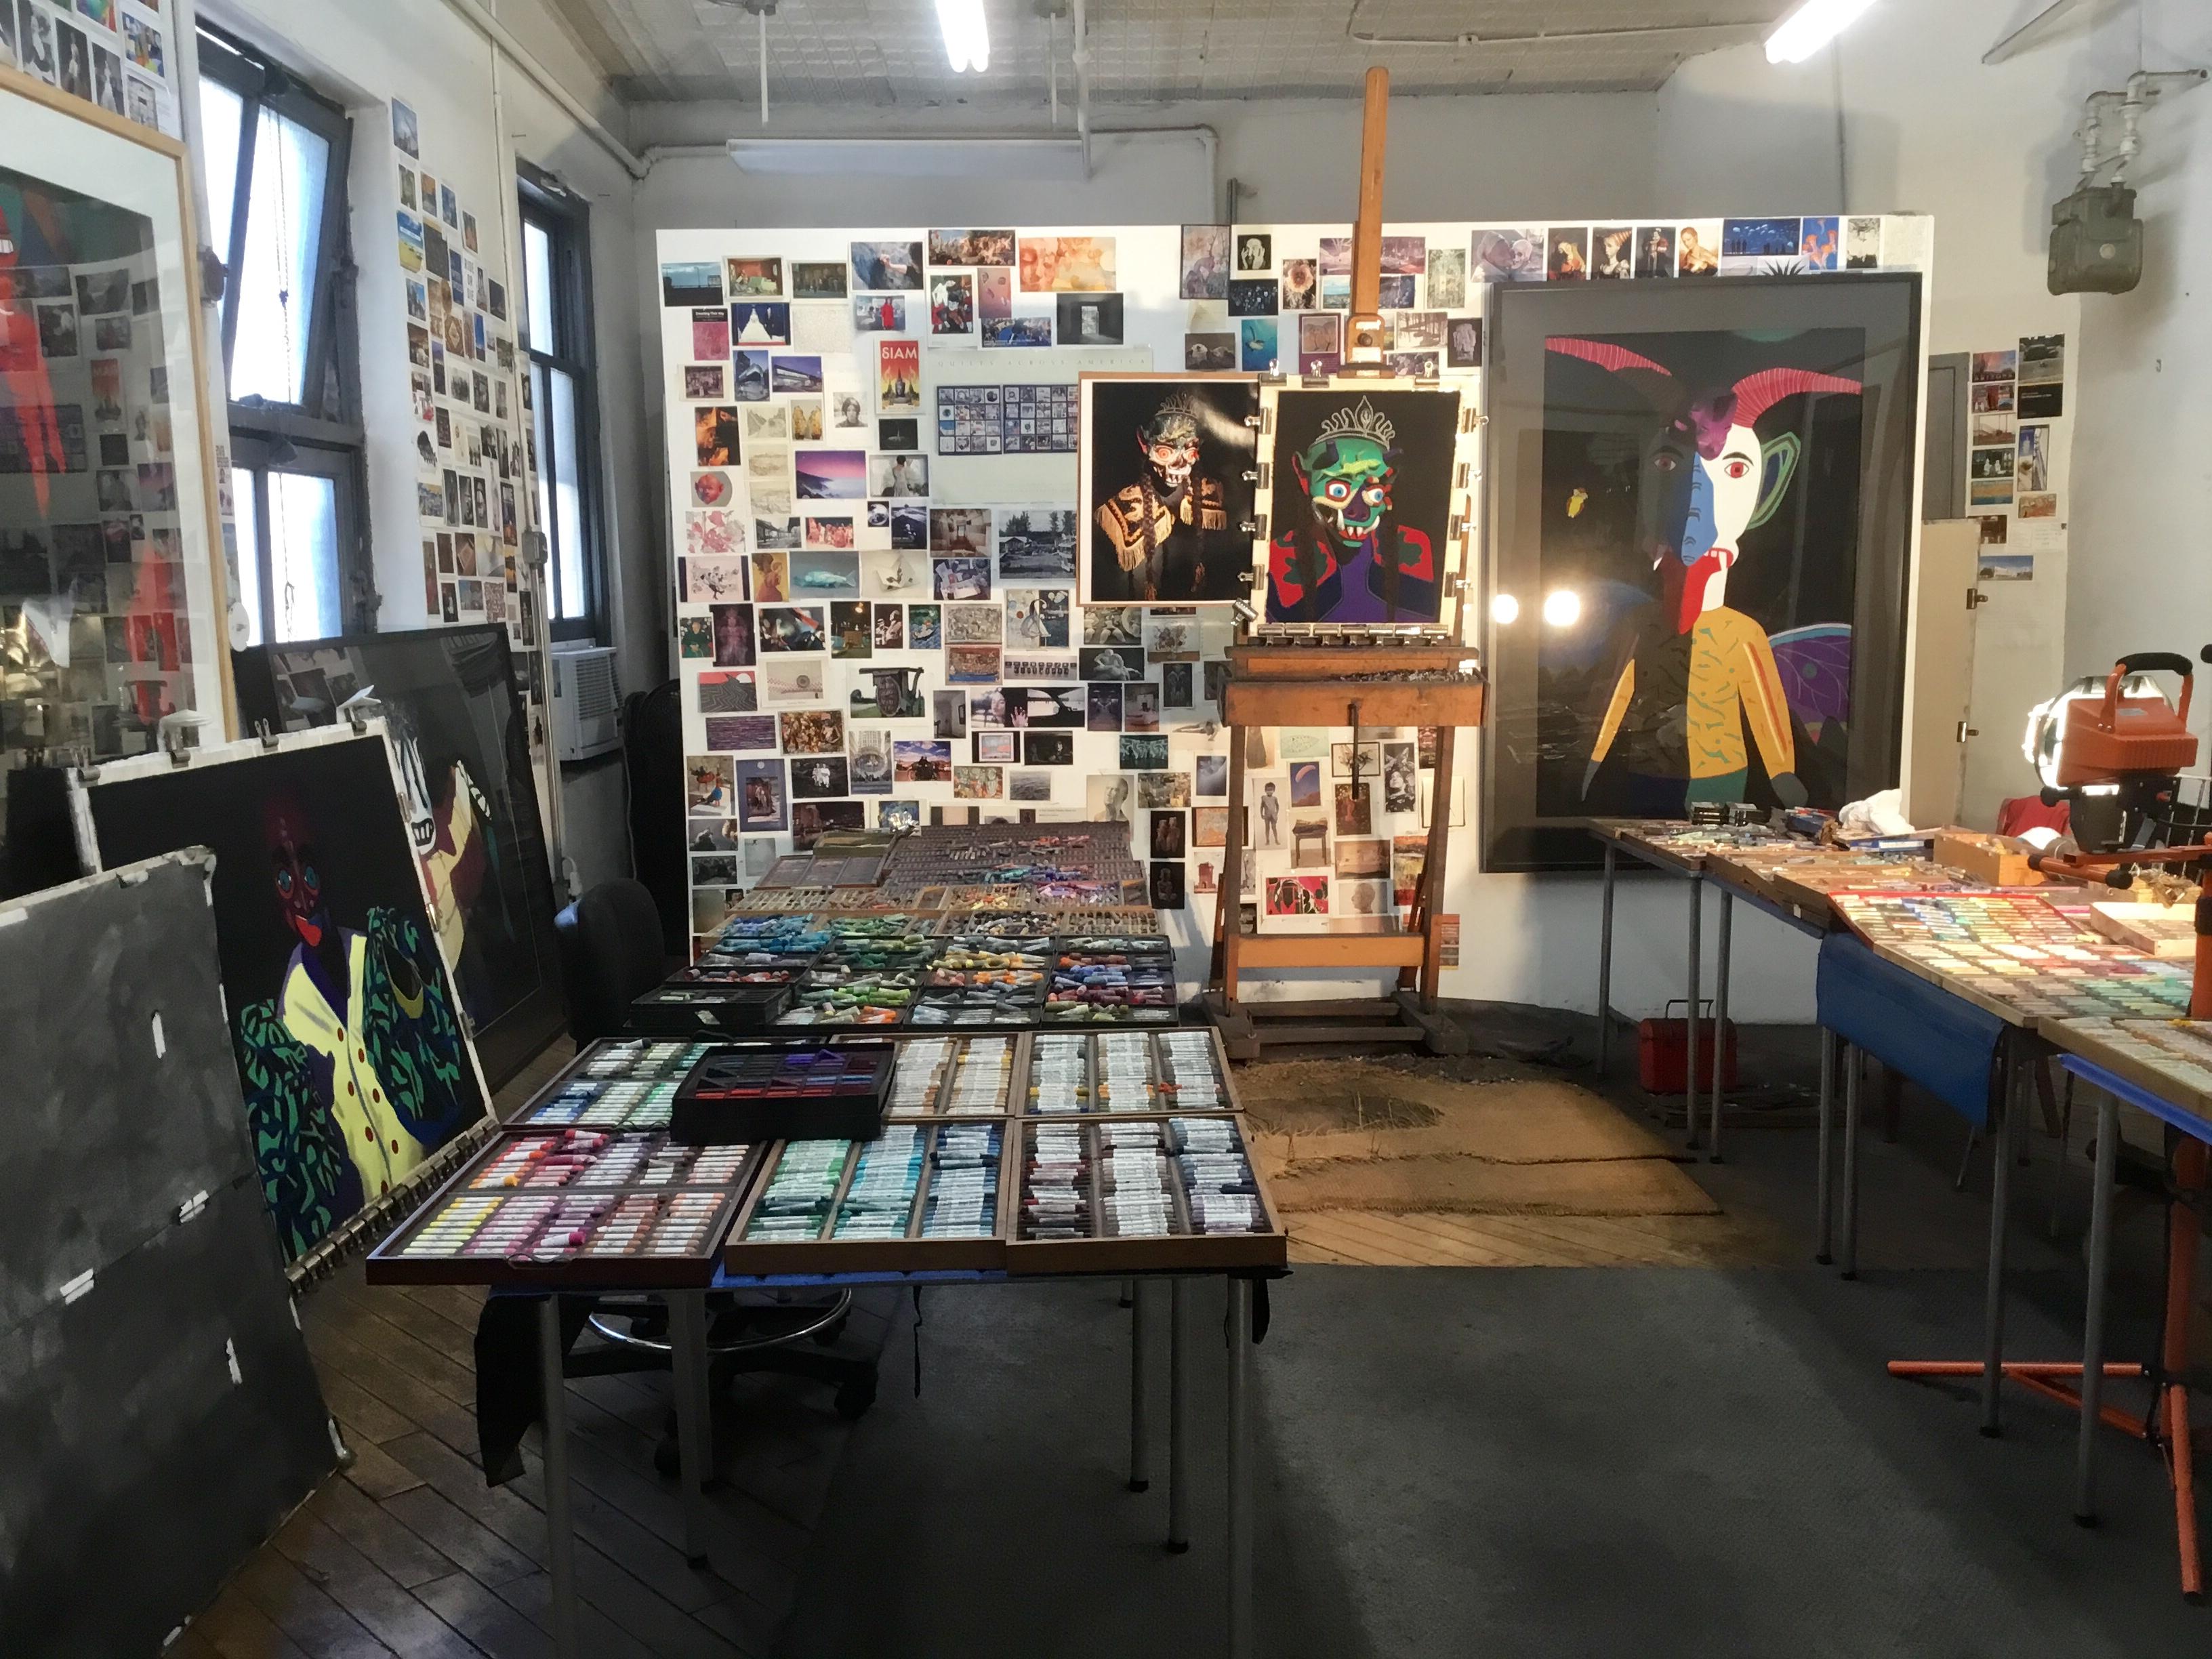 Studio with works in progress